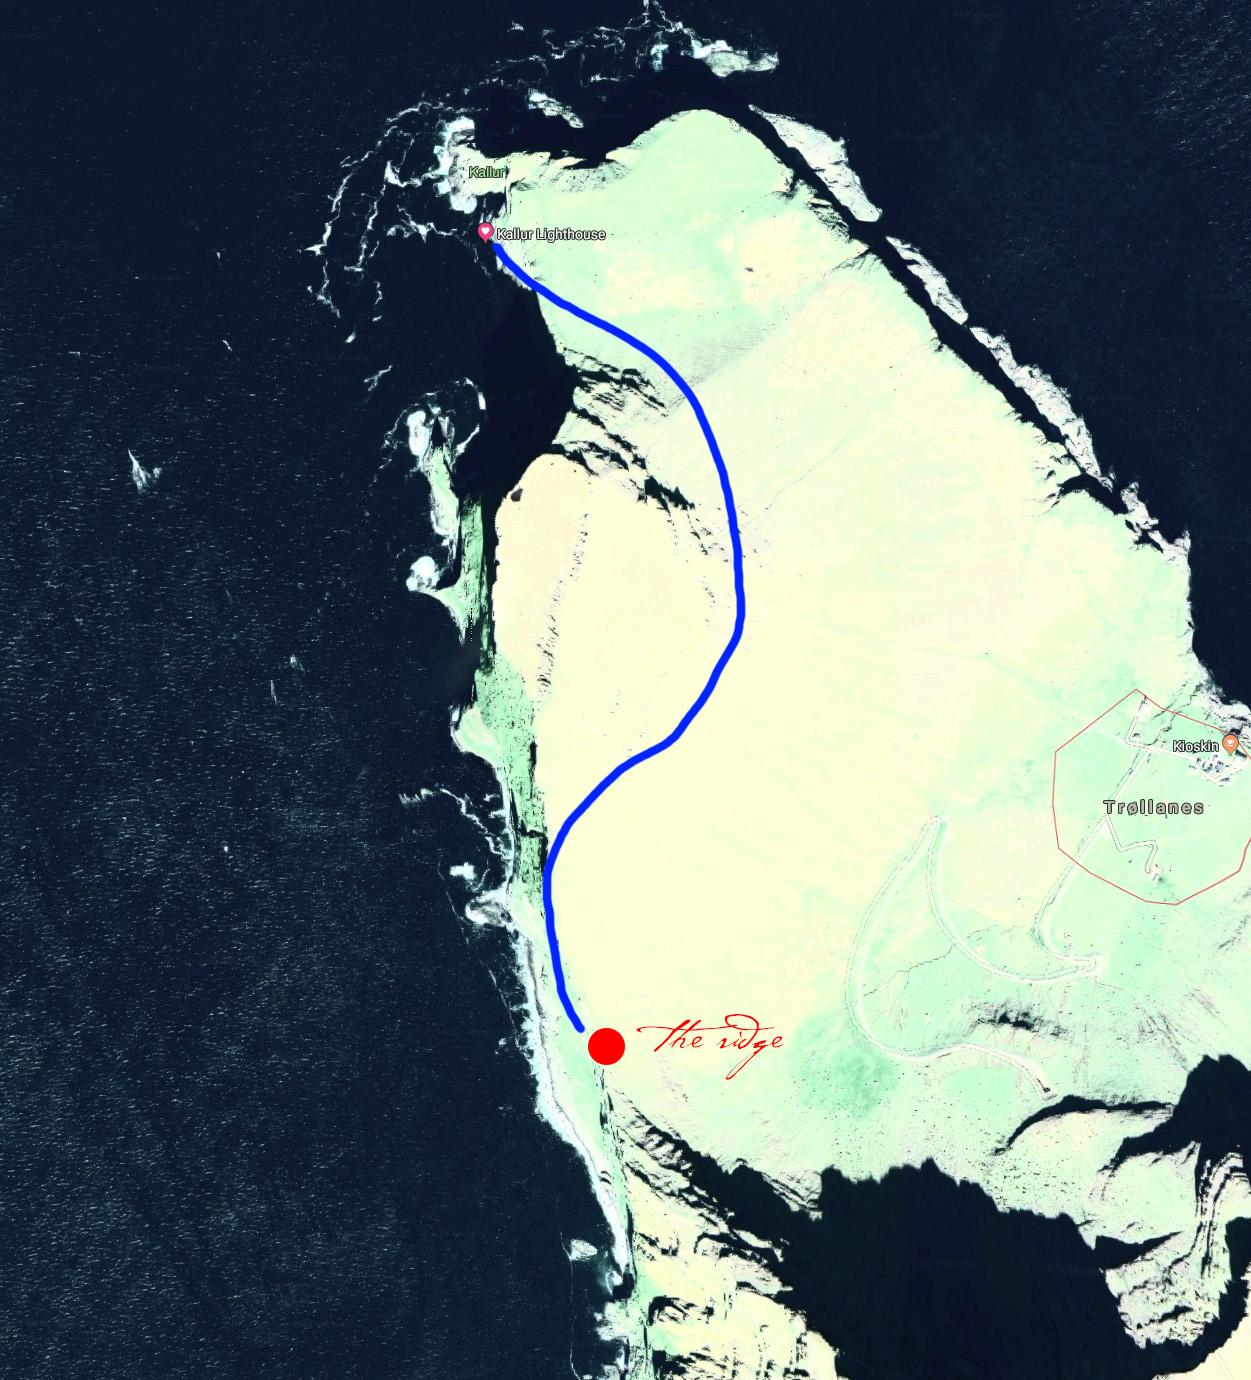 Hike map from Kallur Lighthouse to Nestindar, Borgarin